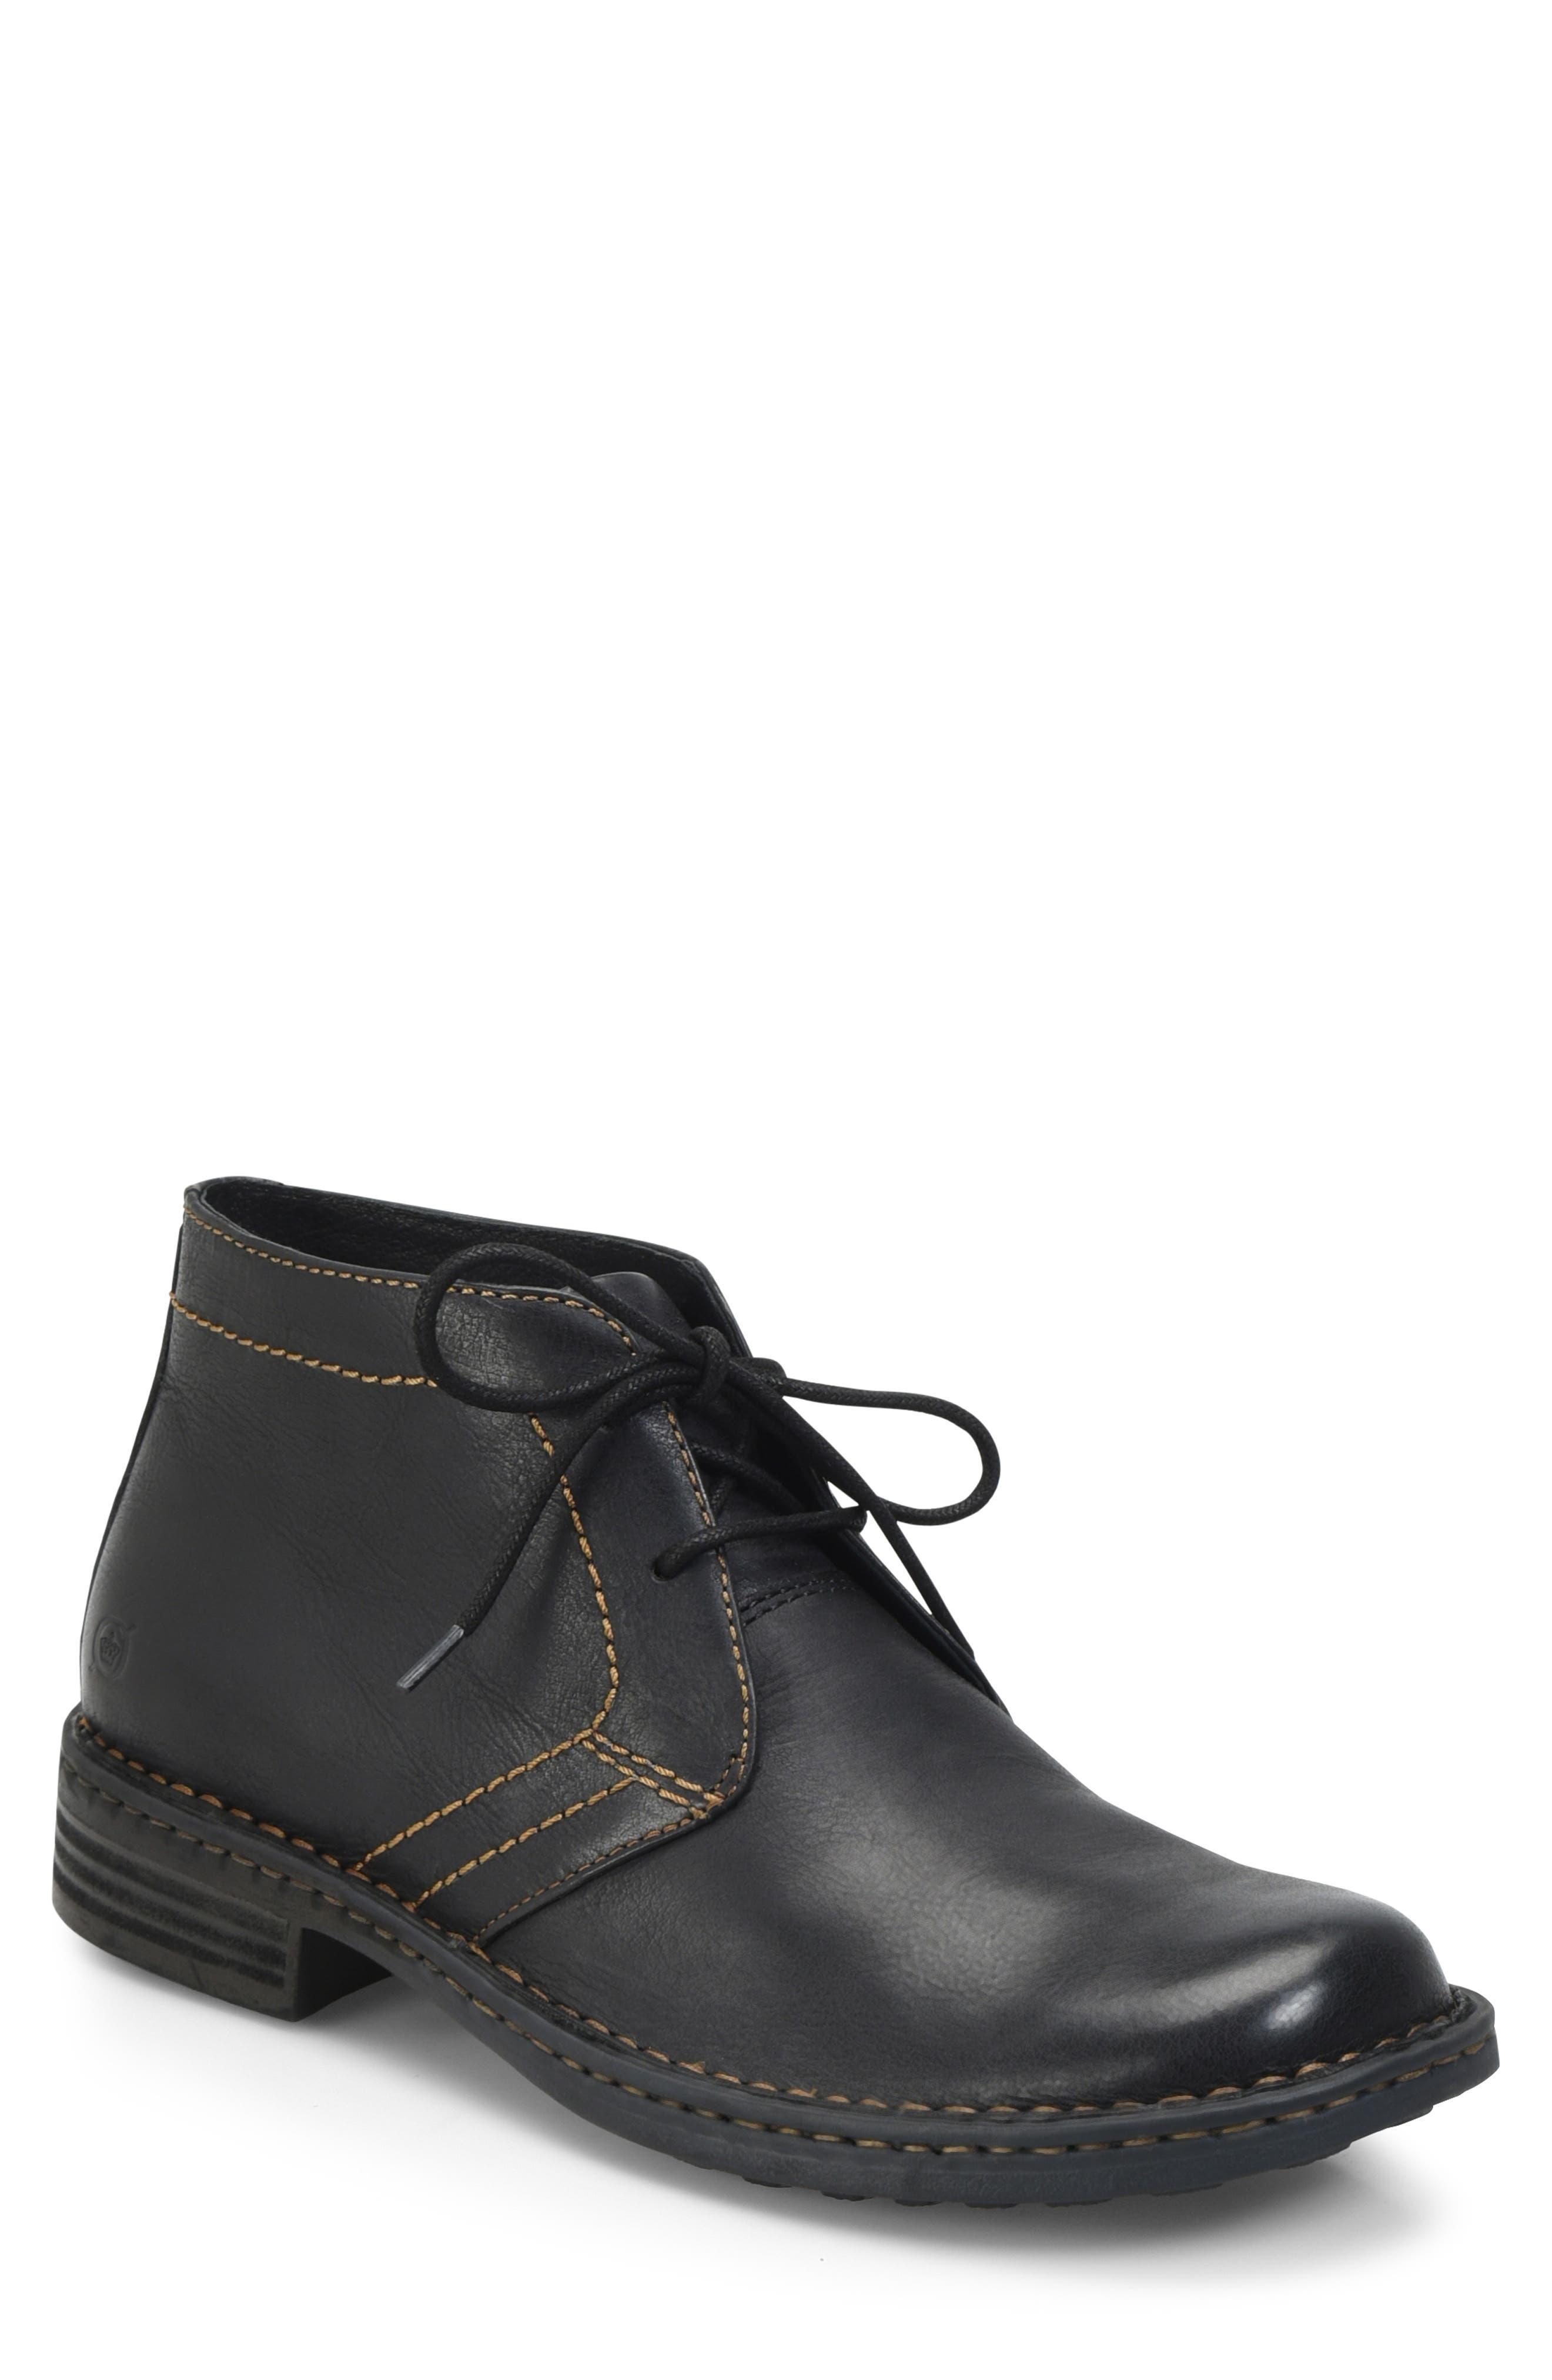 'Harrison' Chukka Boot,                         Main,                         color, BLACK LEATHER